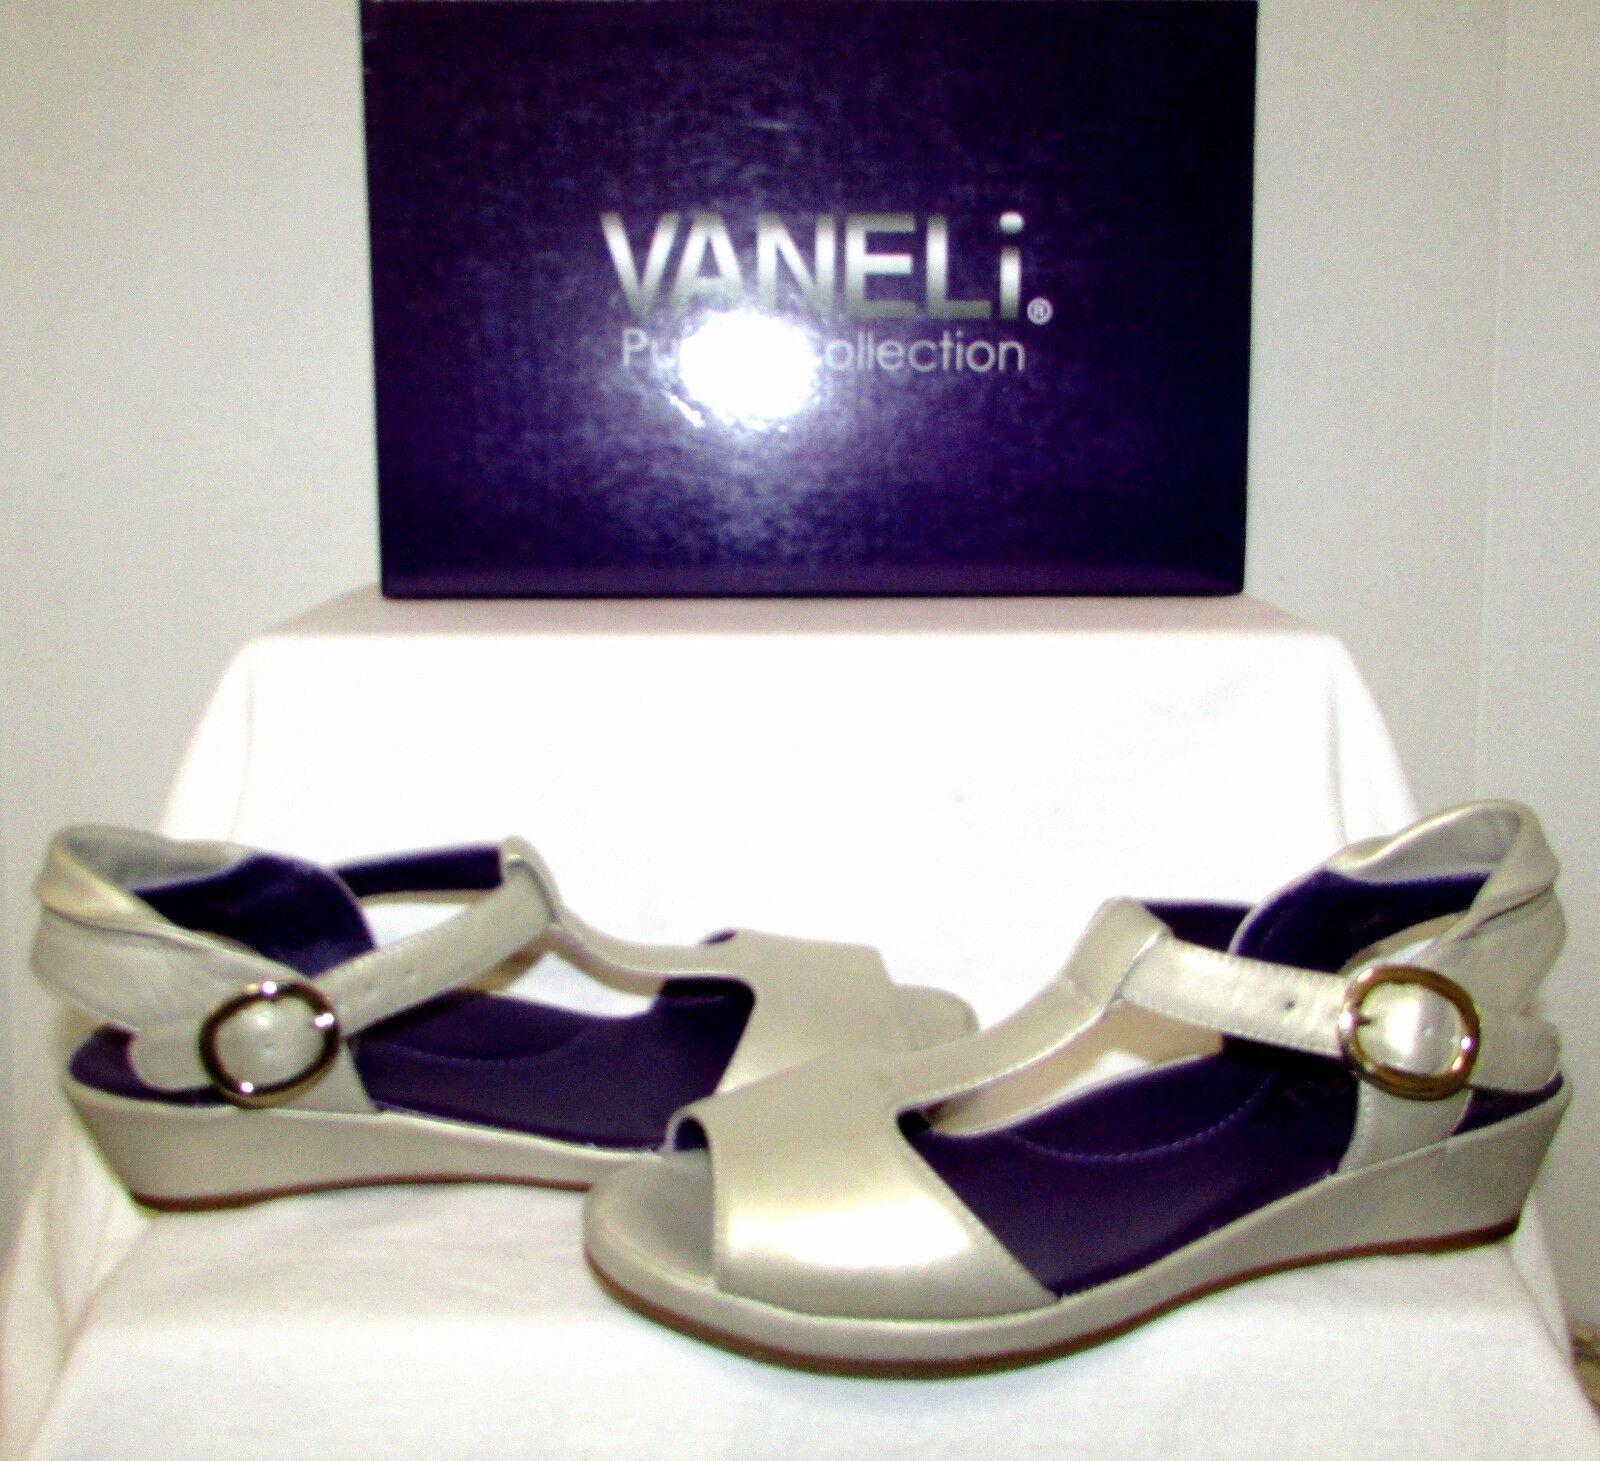 NEW VANELI DIXON PLATINO WITTY (BEIGE) METALLIC LEATHER COMFORT SANDALS SIZE 7.5